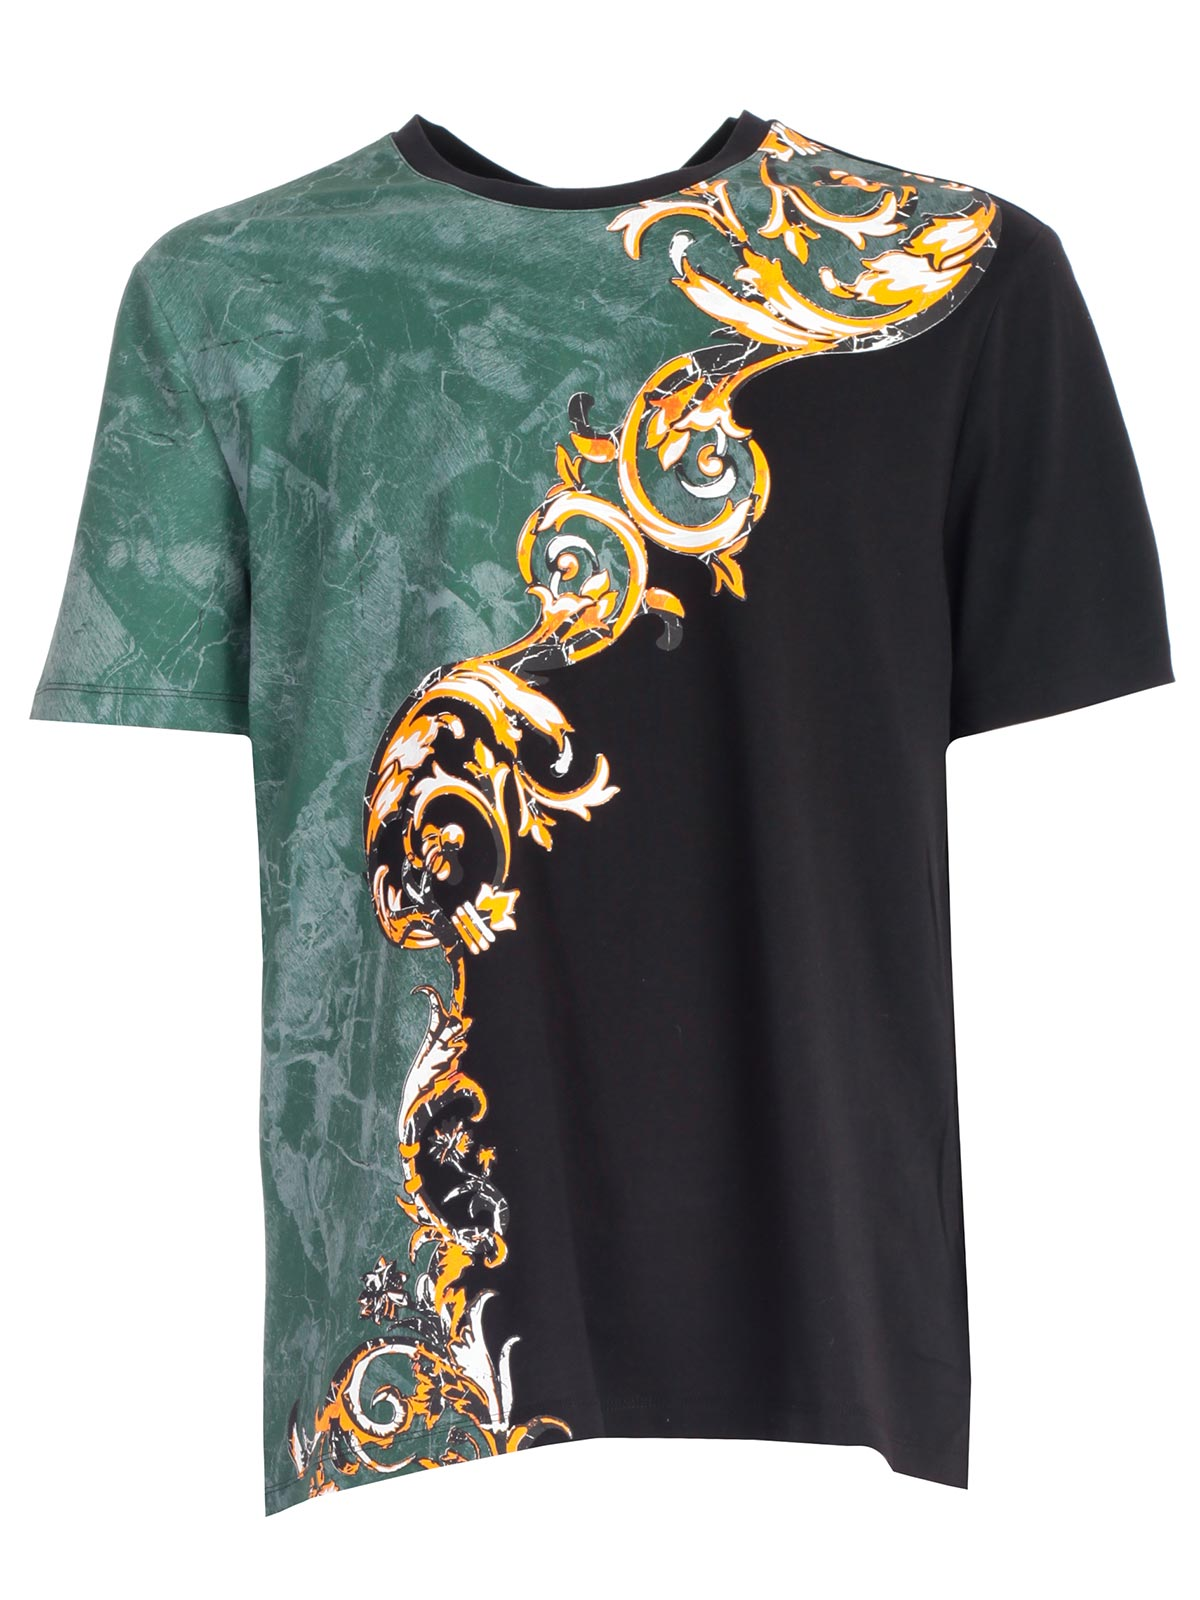 69ed4bf96c8be1 Versace Collection T- Shirt V800683R.VJ00598 - V7008 BLACK ...